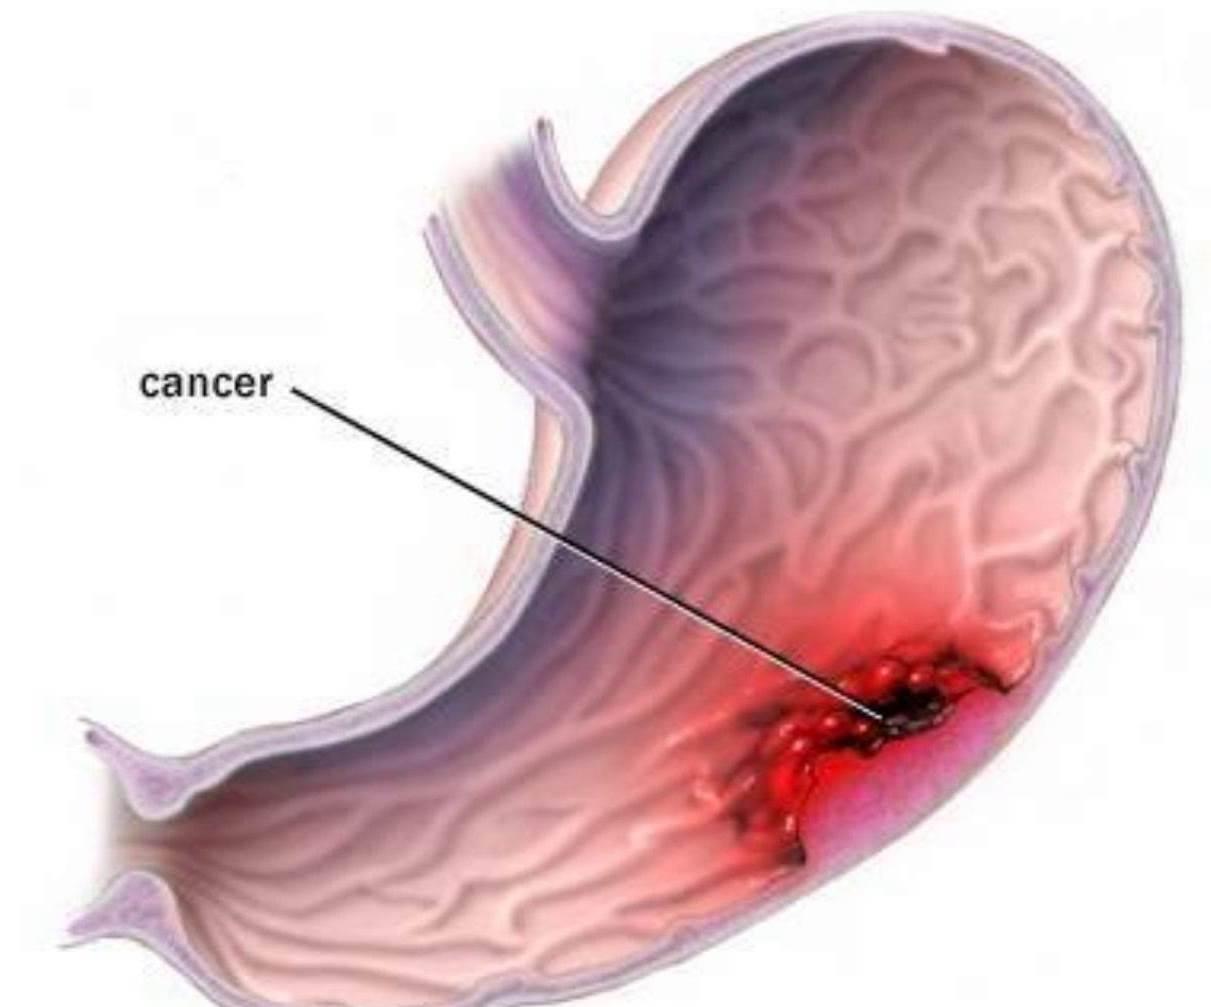 sintomas de cancer de estomago